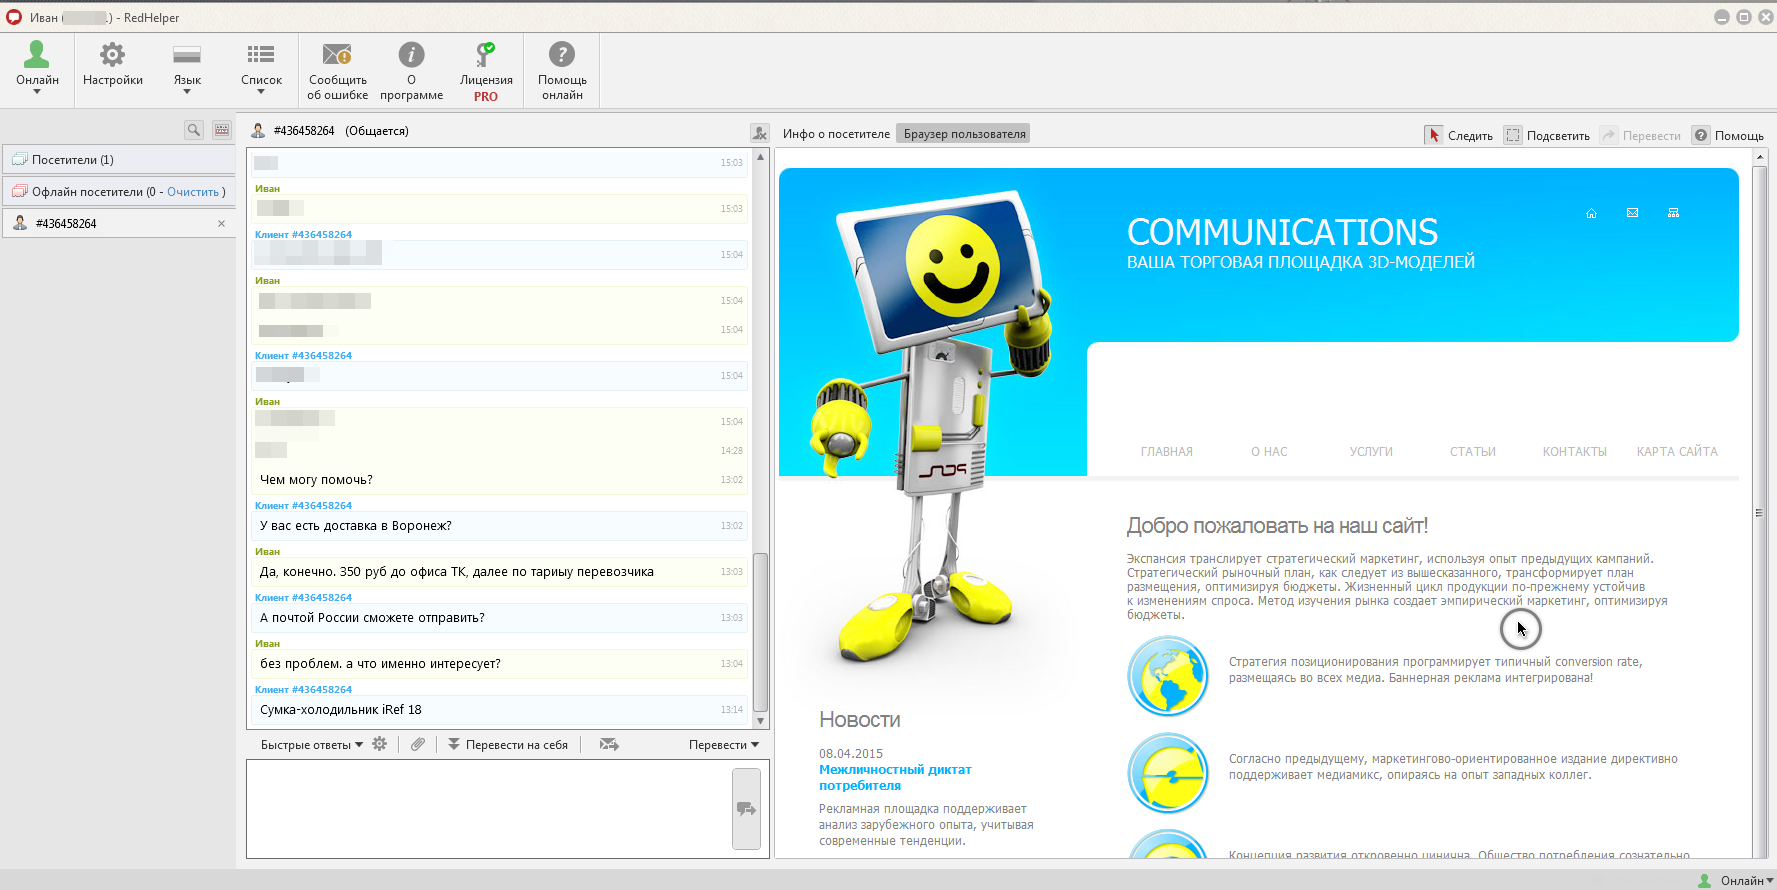 Онлайн-консультанты — обзор ТОП-сервисов: RedHelper, Livetex, Jivosite, Onicon - 4